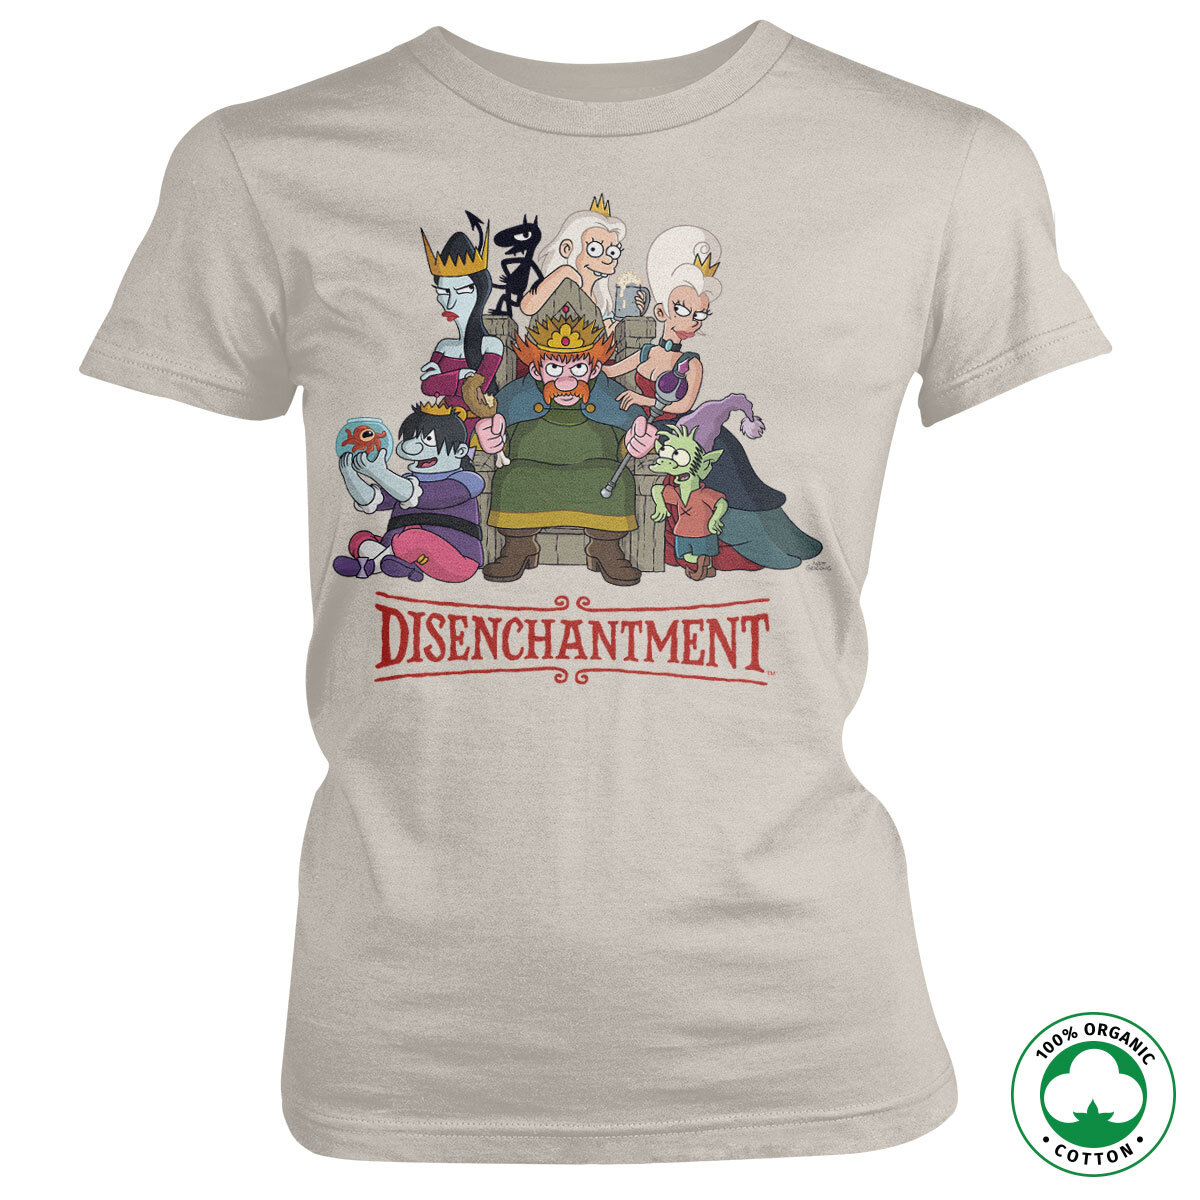 Disenchantment Organic Girly Tee